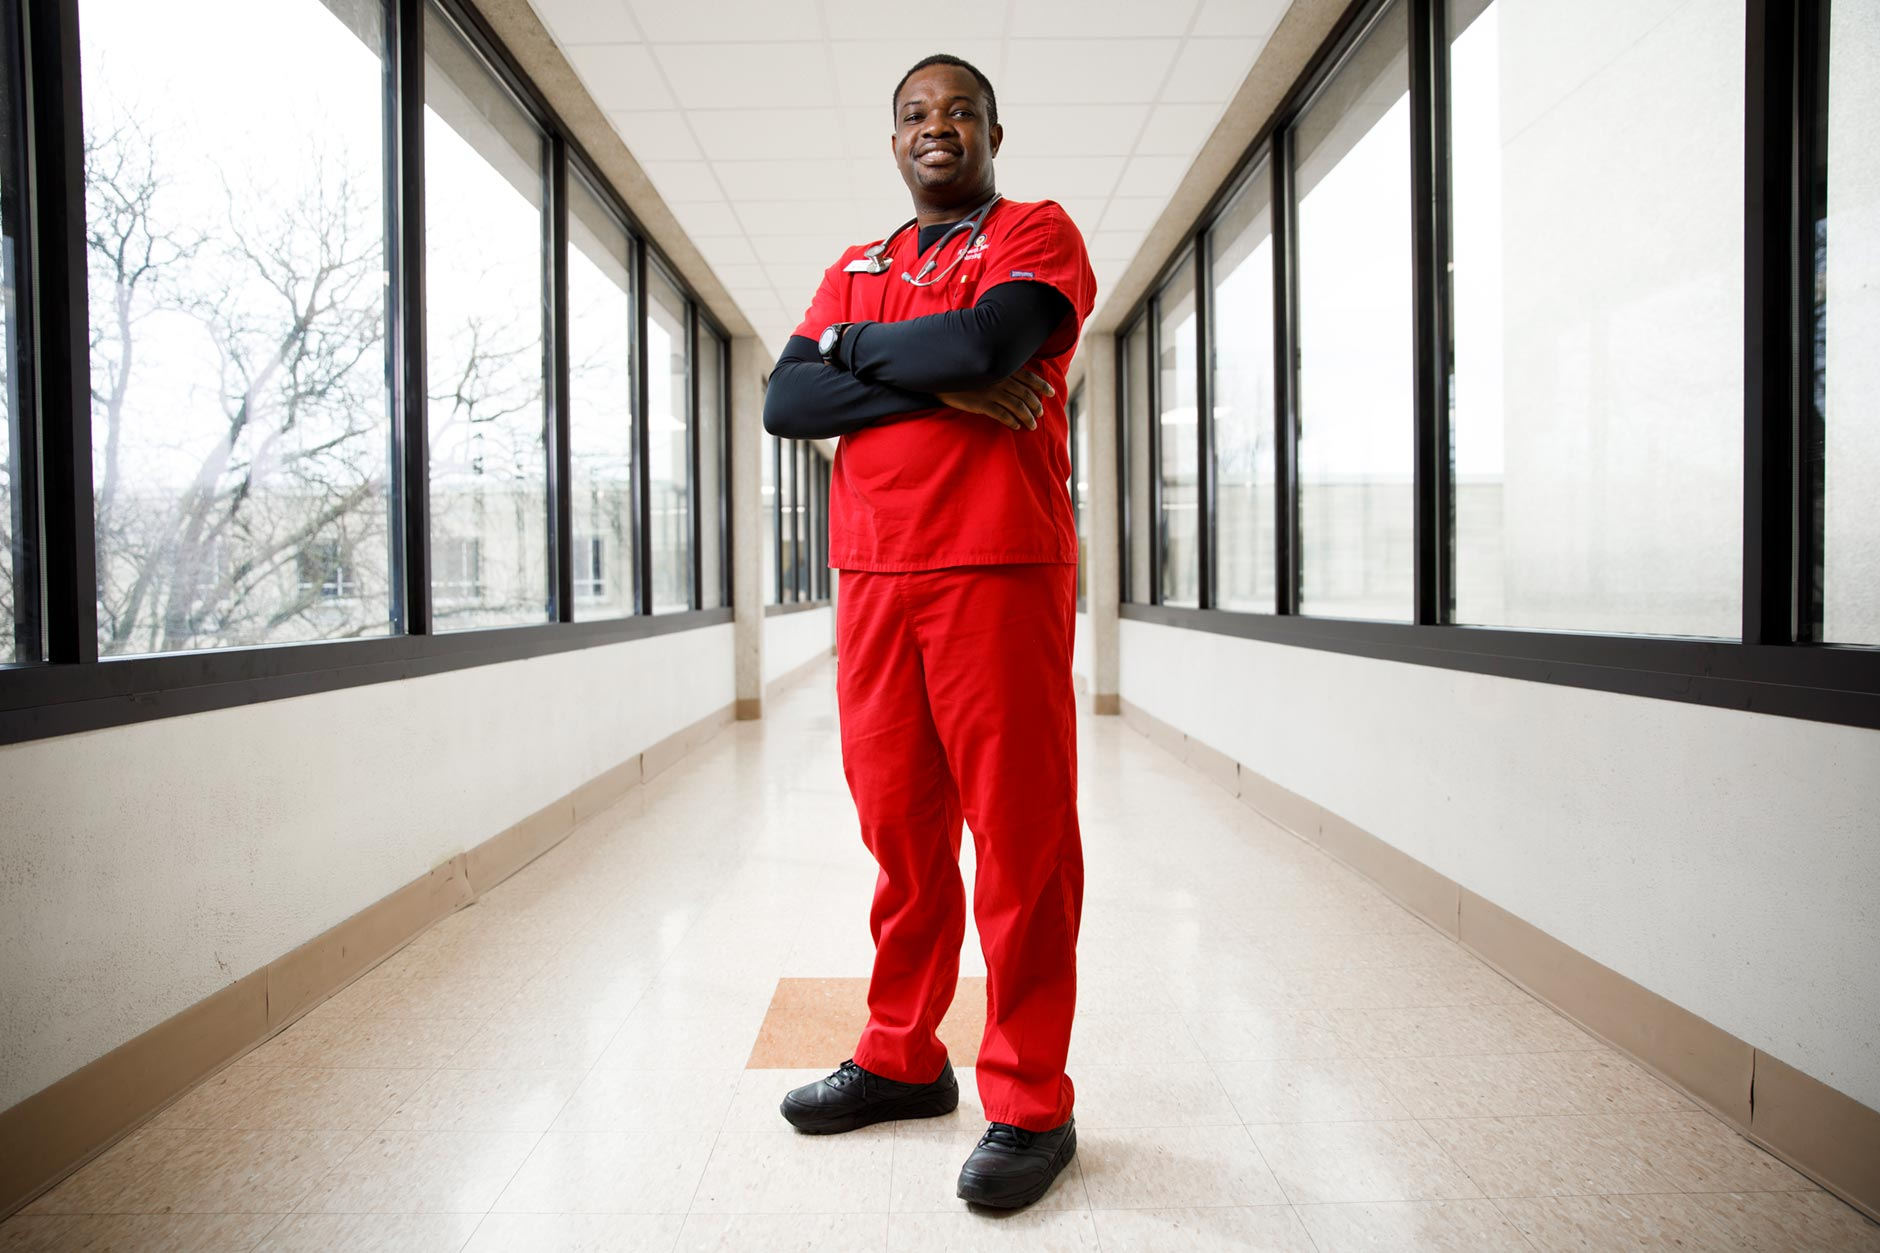 Desmond Atem, a graduating senior at IU South Bend, poses for a portrait in South Bend on Monday, April 9, 2018. (James Brosher/IU Communications)